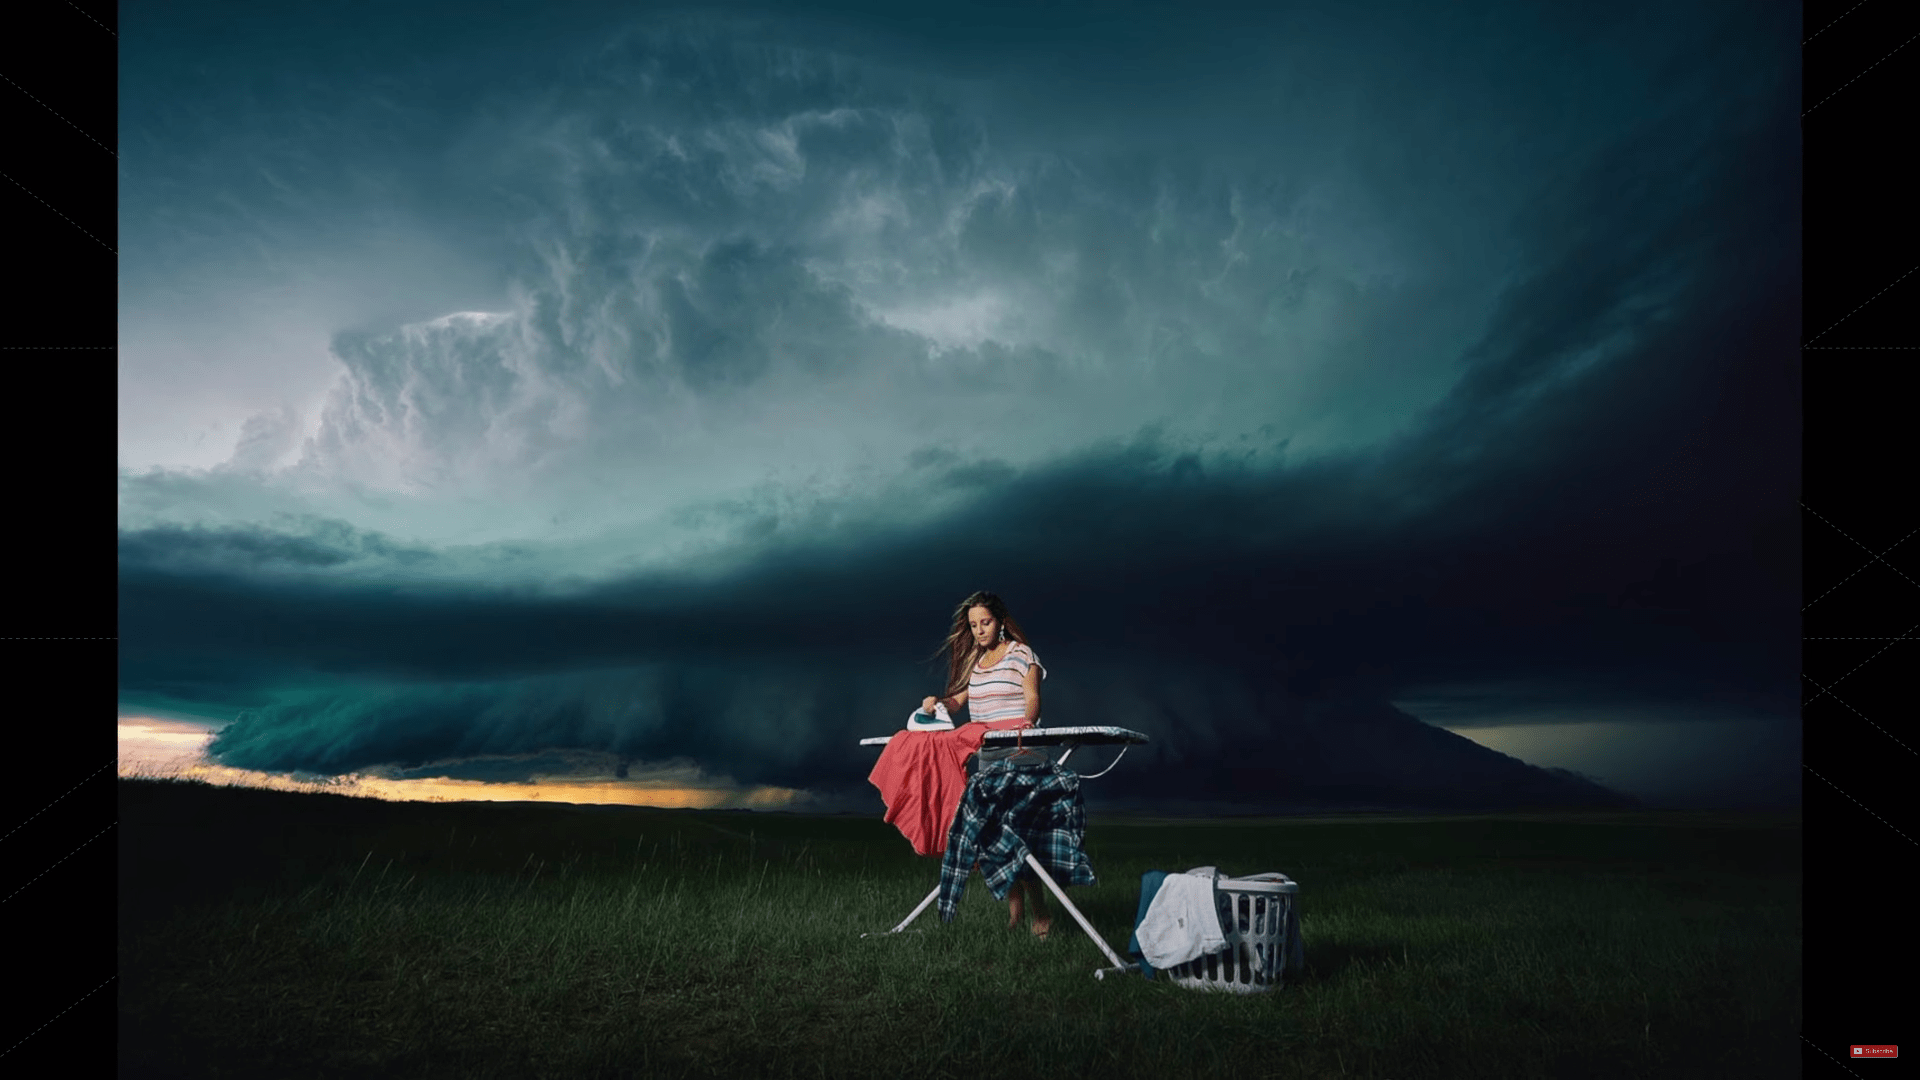 storm min image